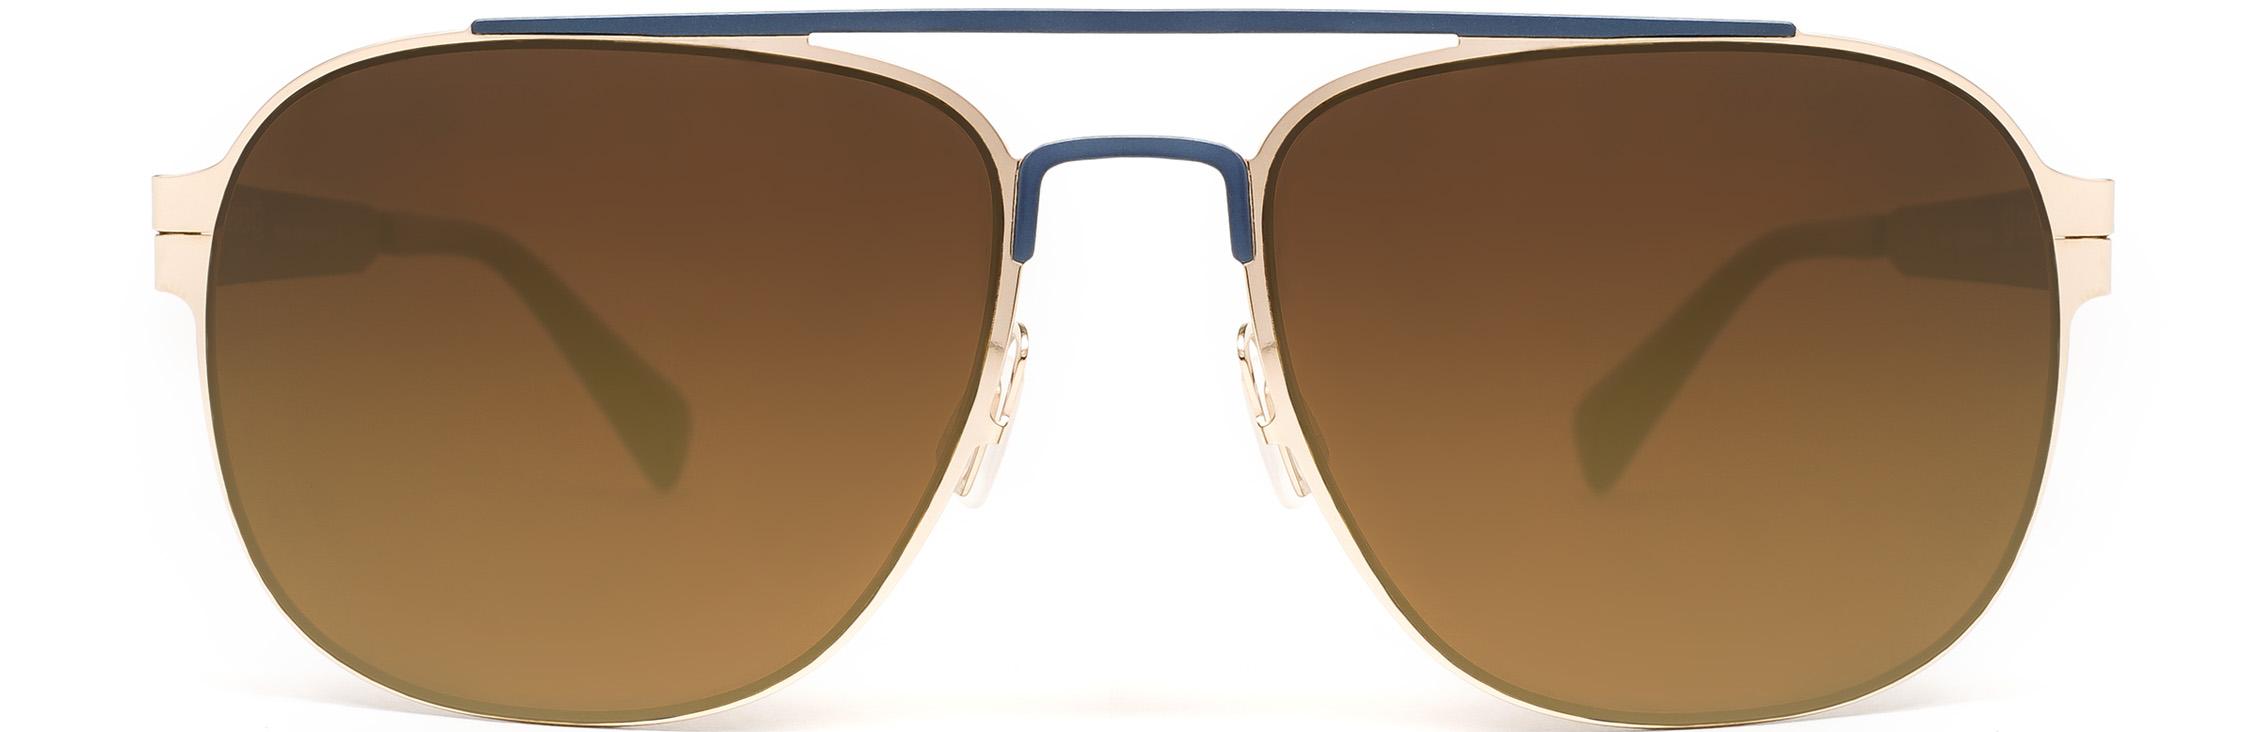 Gold-Navy Blue